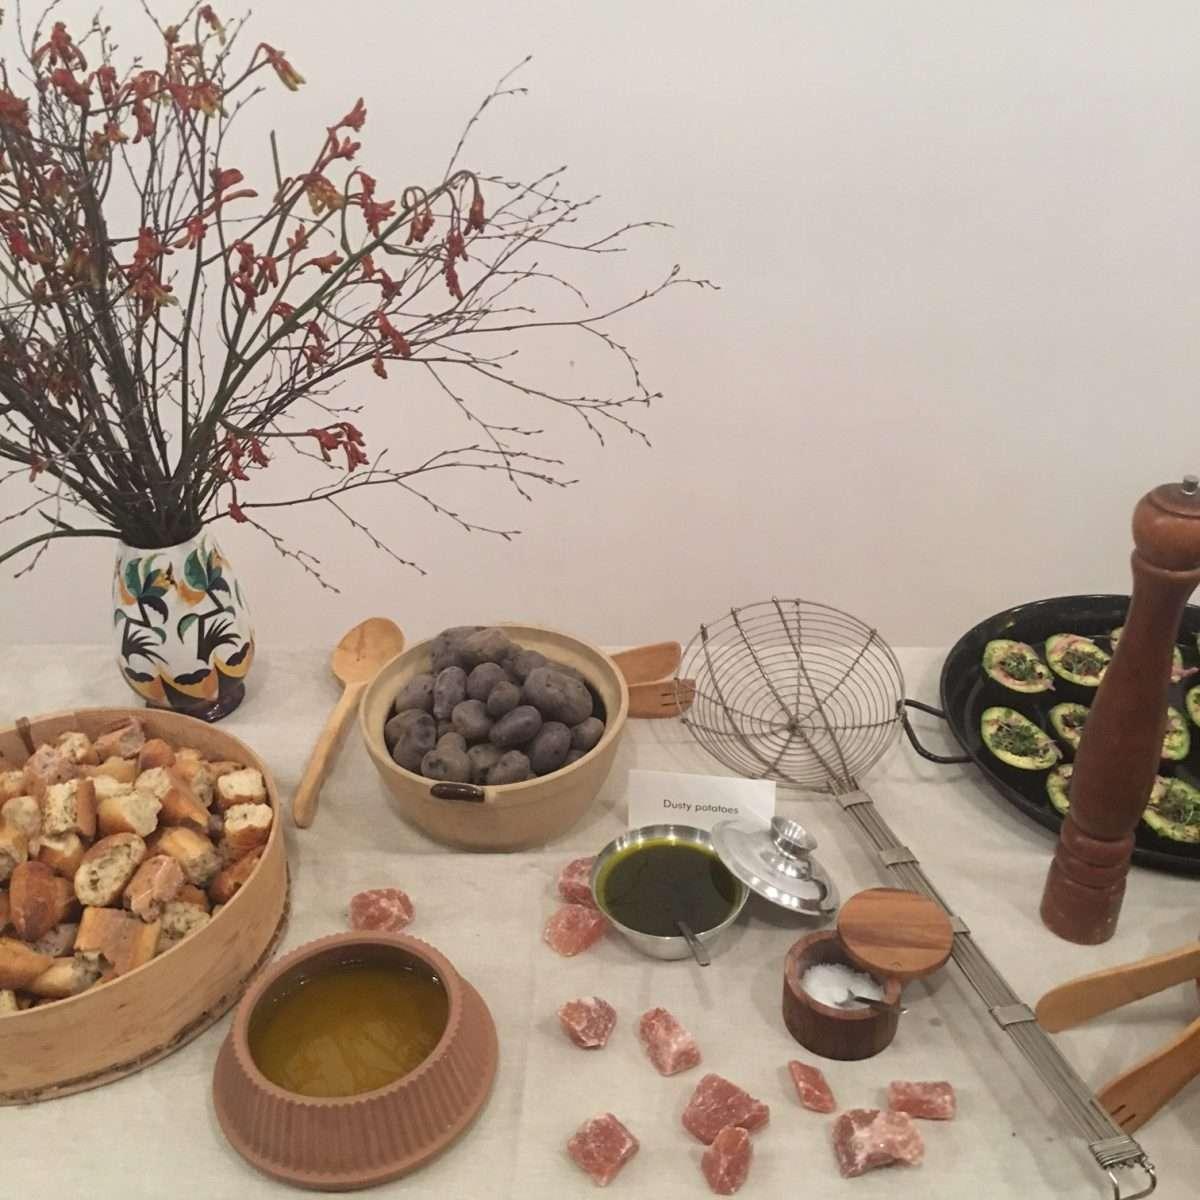 Meat & Potatoes | Apartmento Magazine at Judd Foundation |Laila Gohar